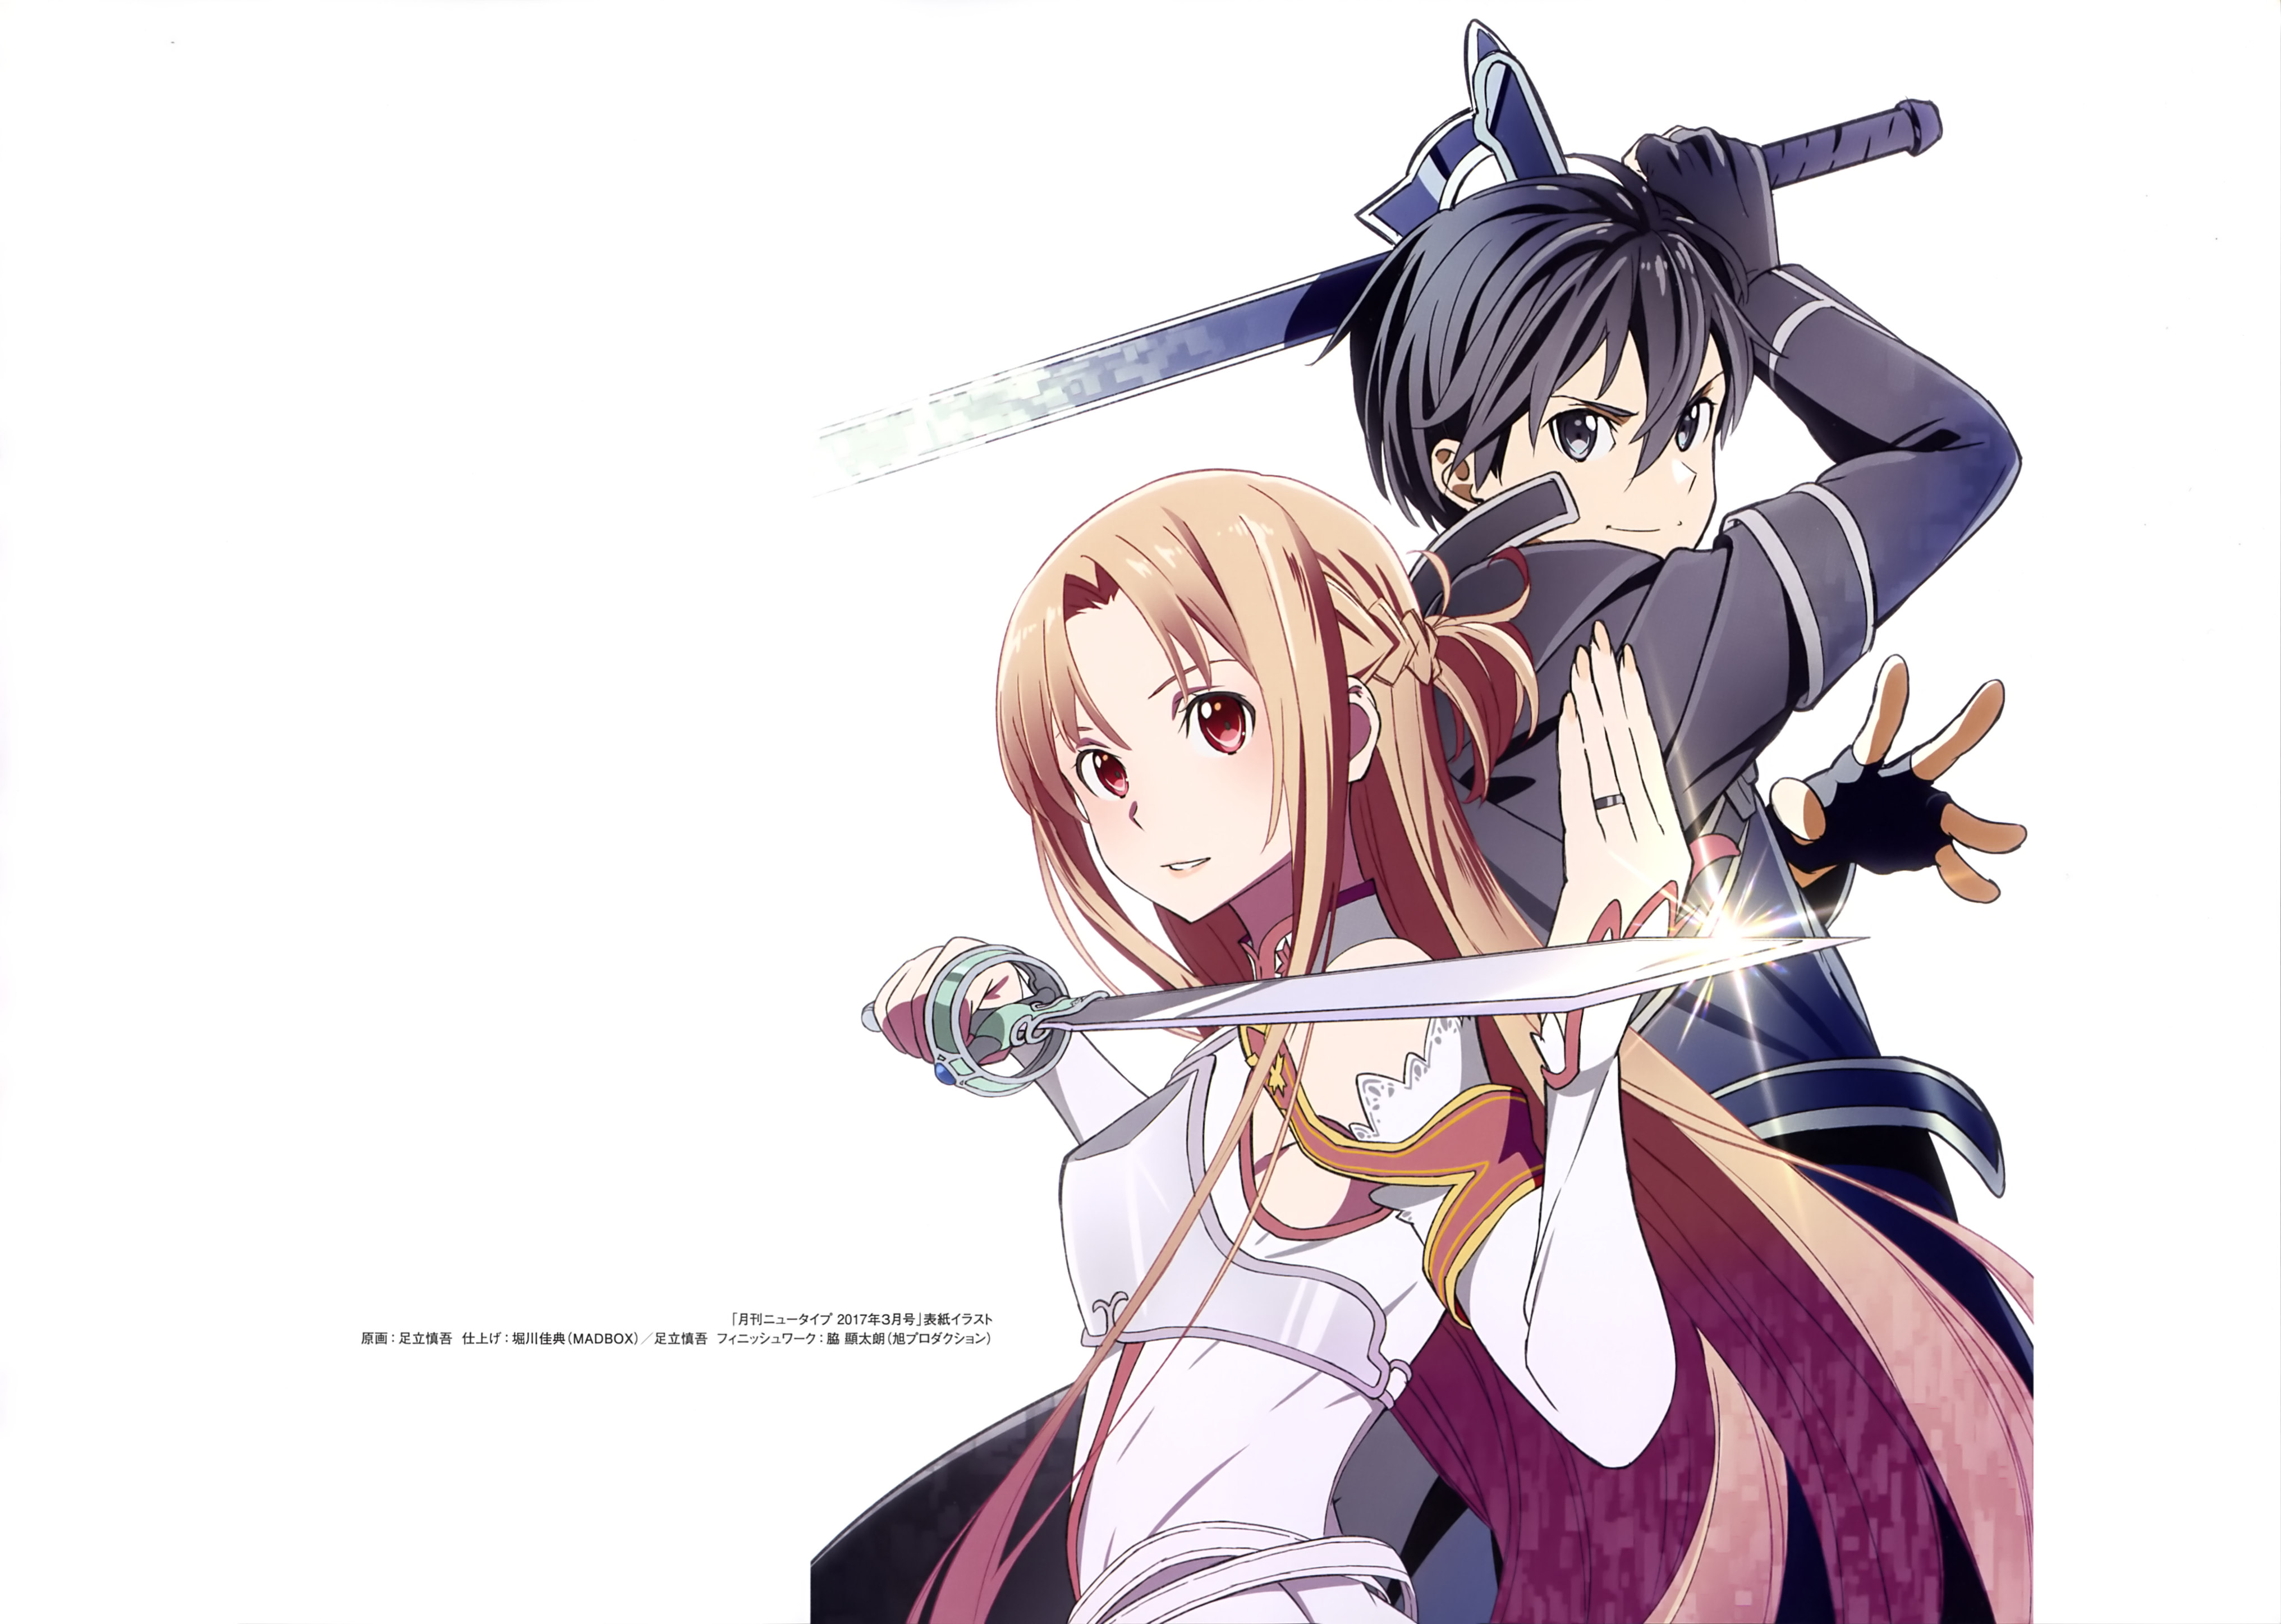 Sword Art Online 4k Ultra Hd Wallpaper Background Image